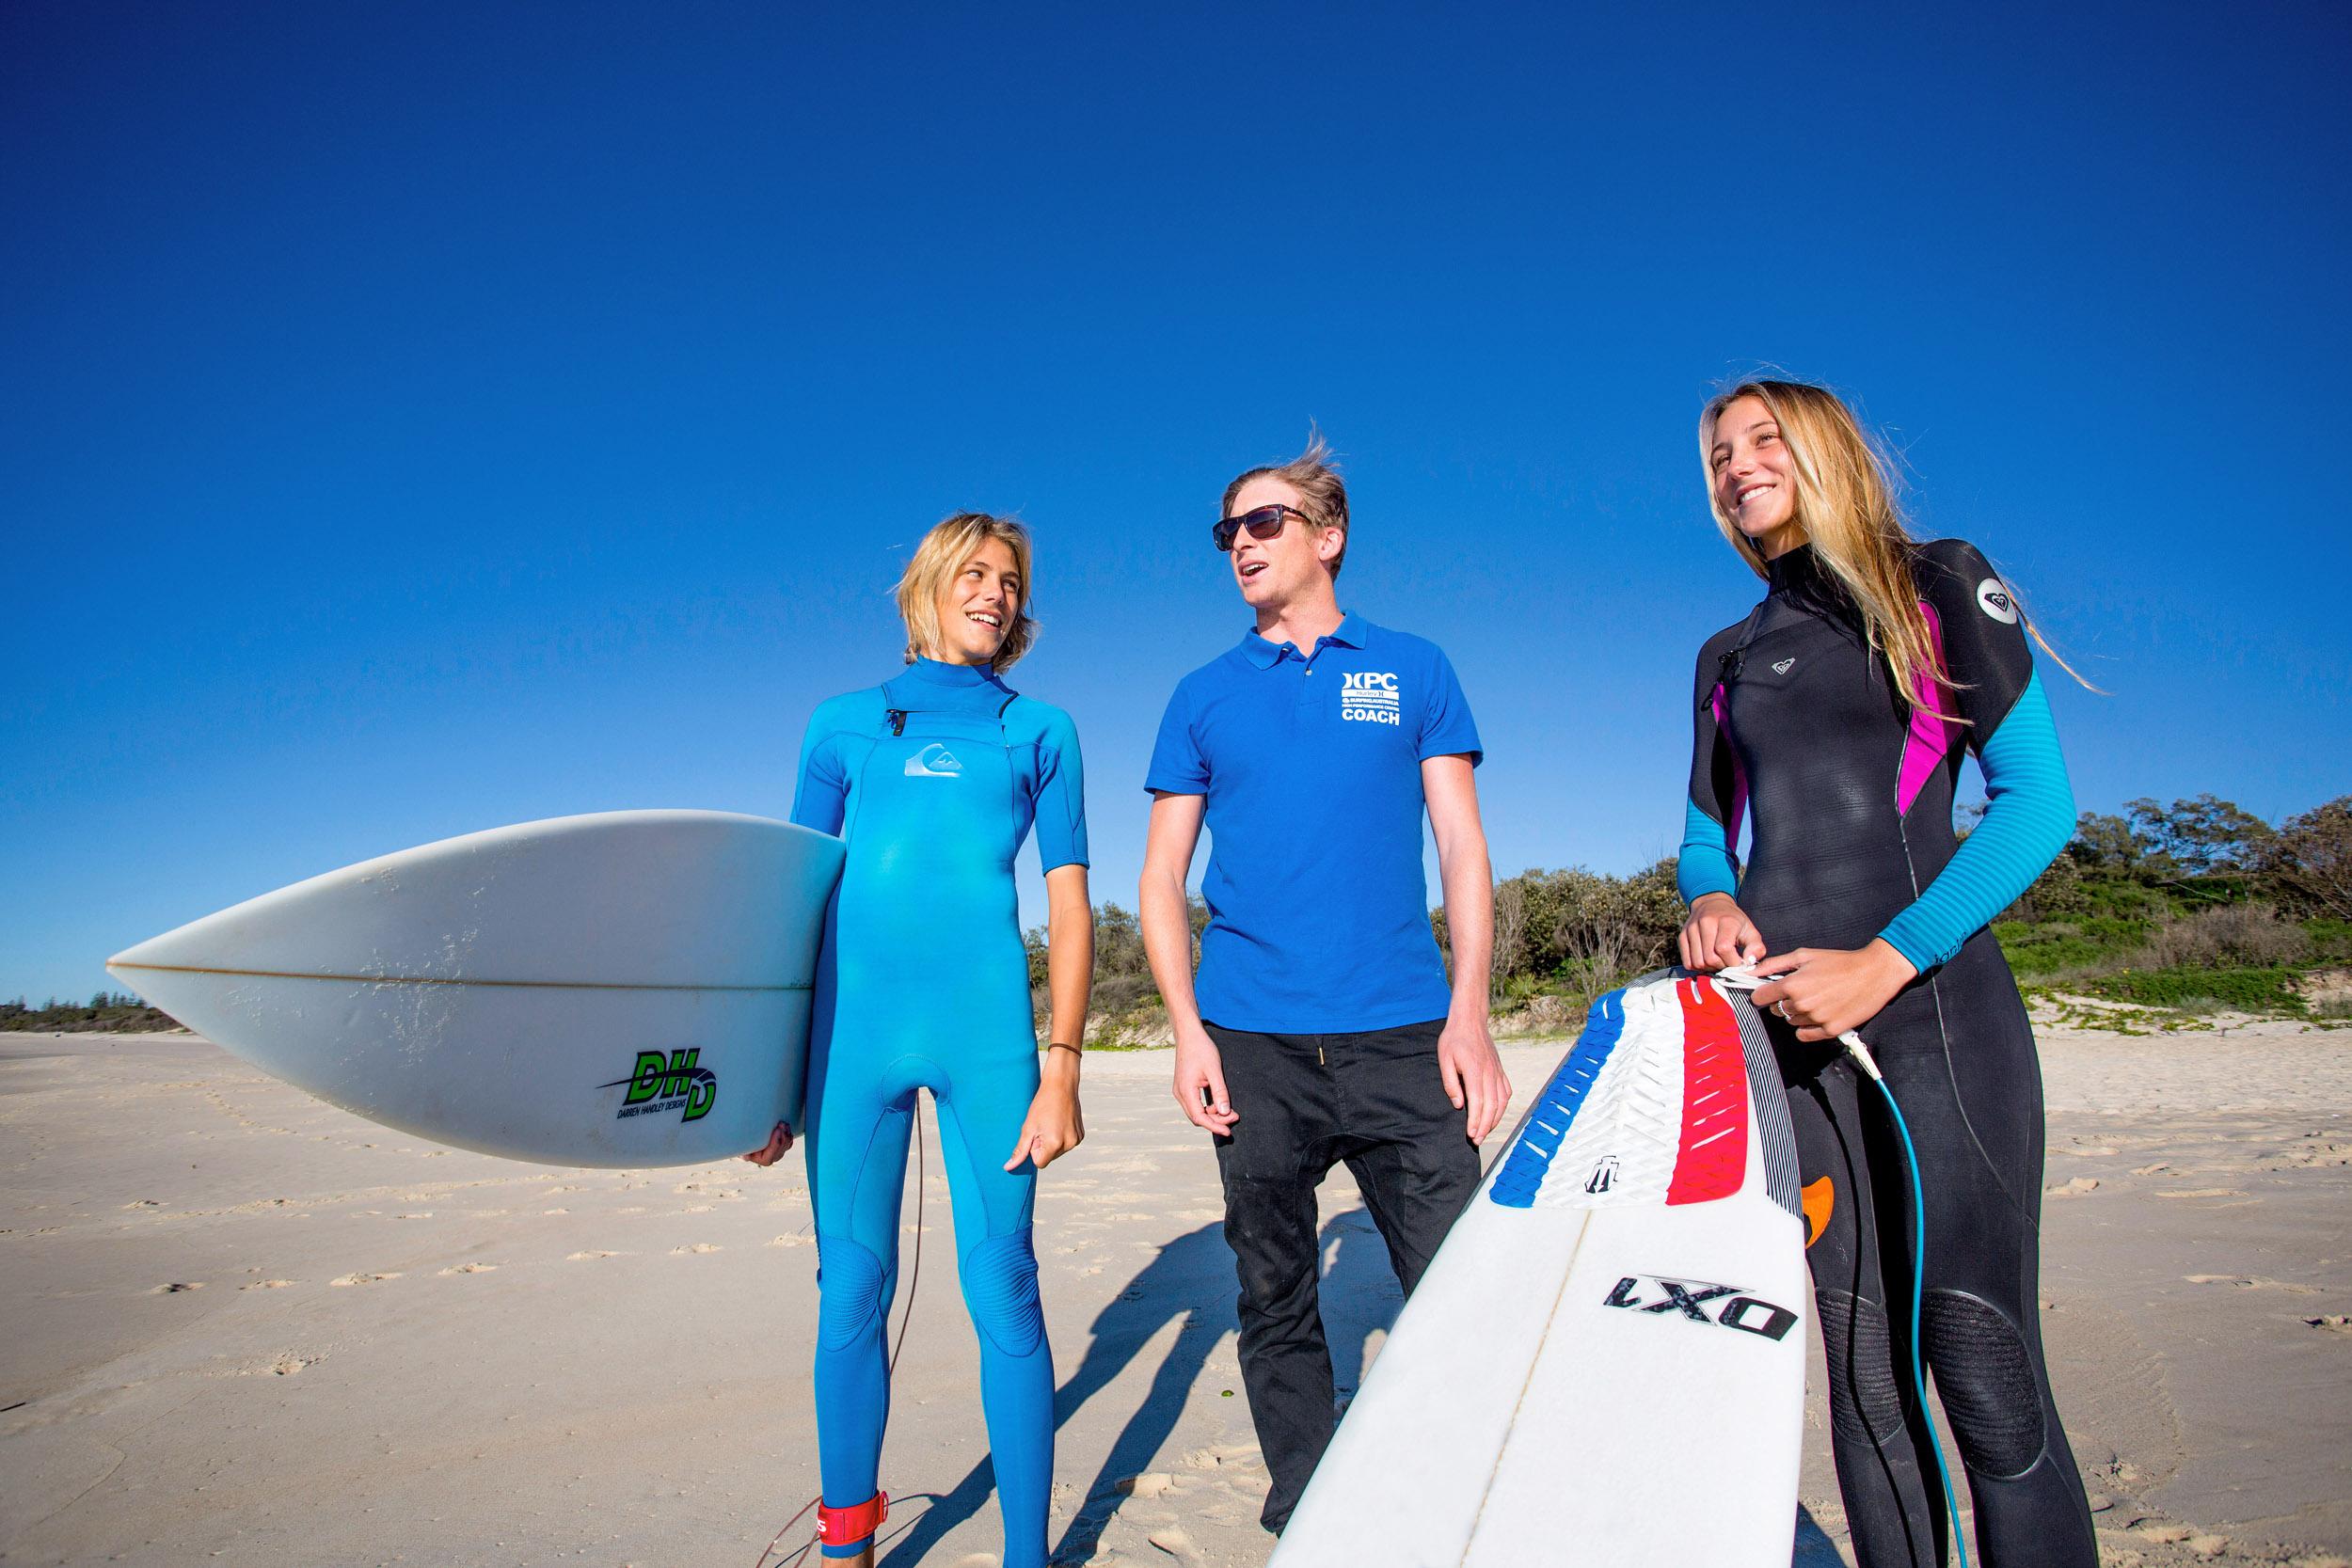 surf-coaching-photography-HPC-372.jpg